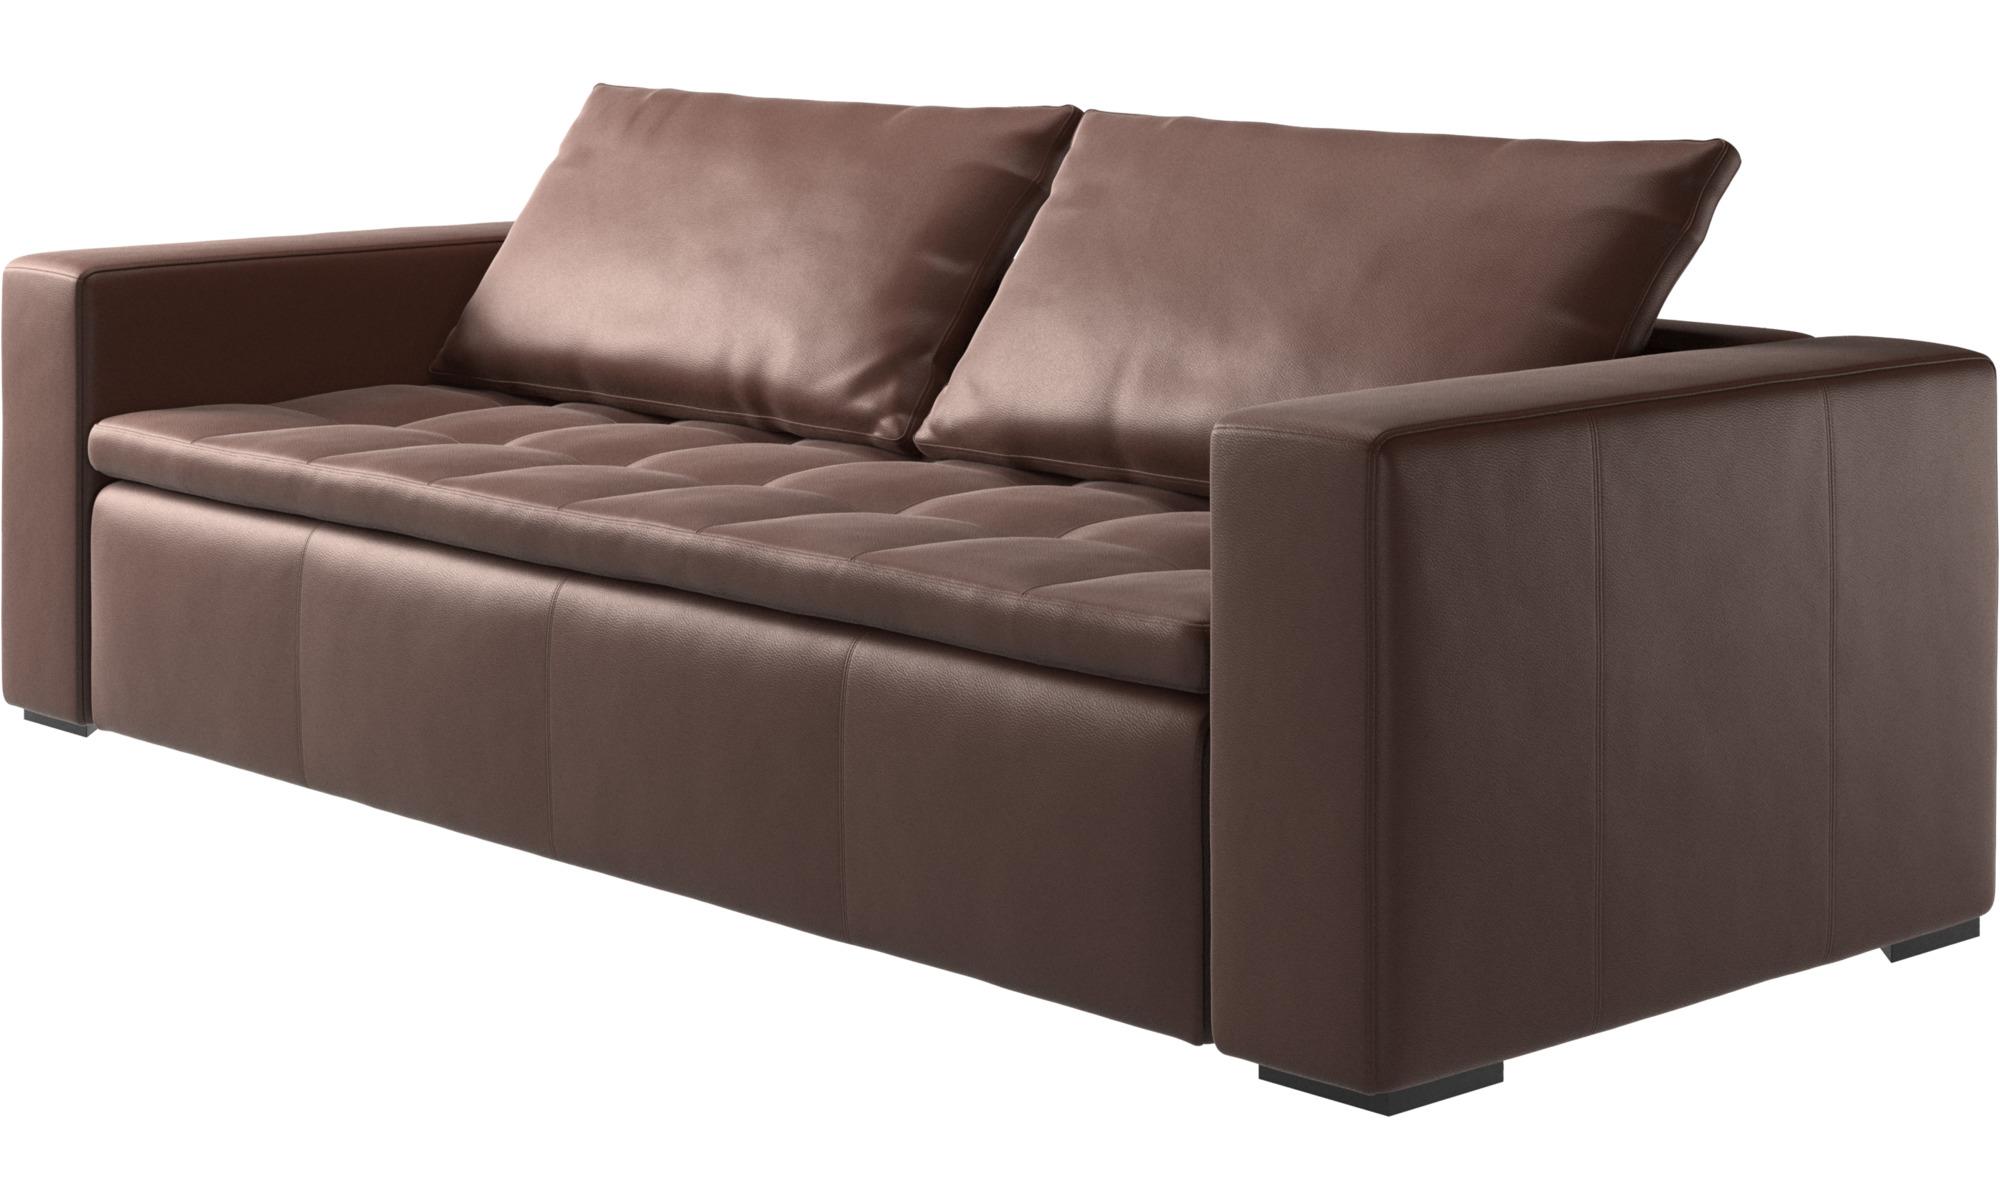 3 seater sofas mezzo sofa boconcept for Sofa rinconera piel